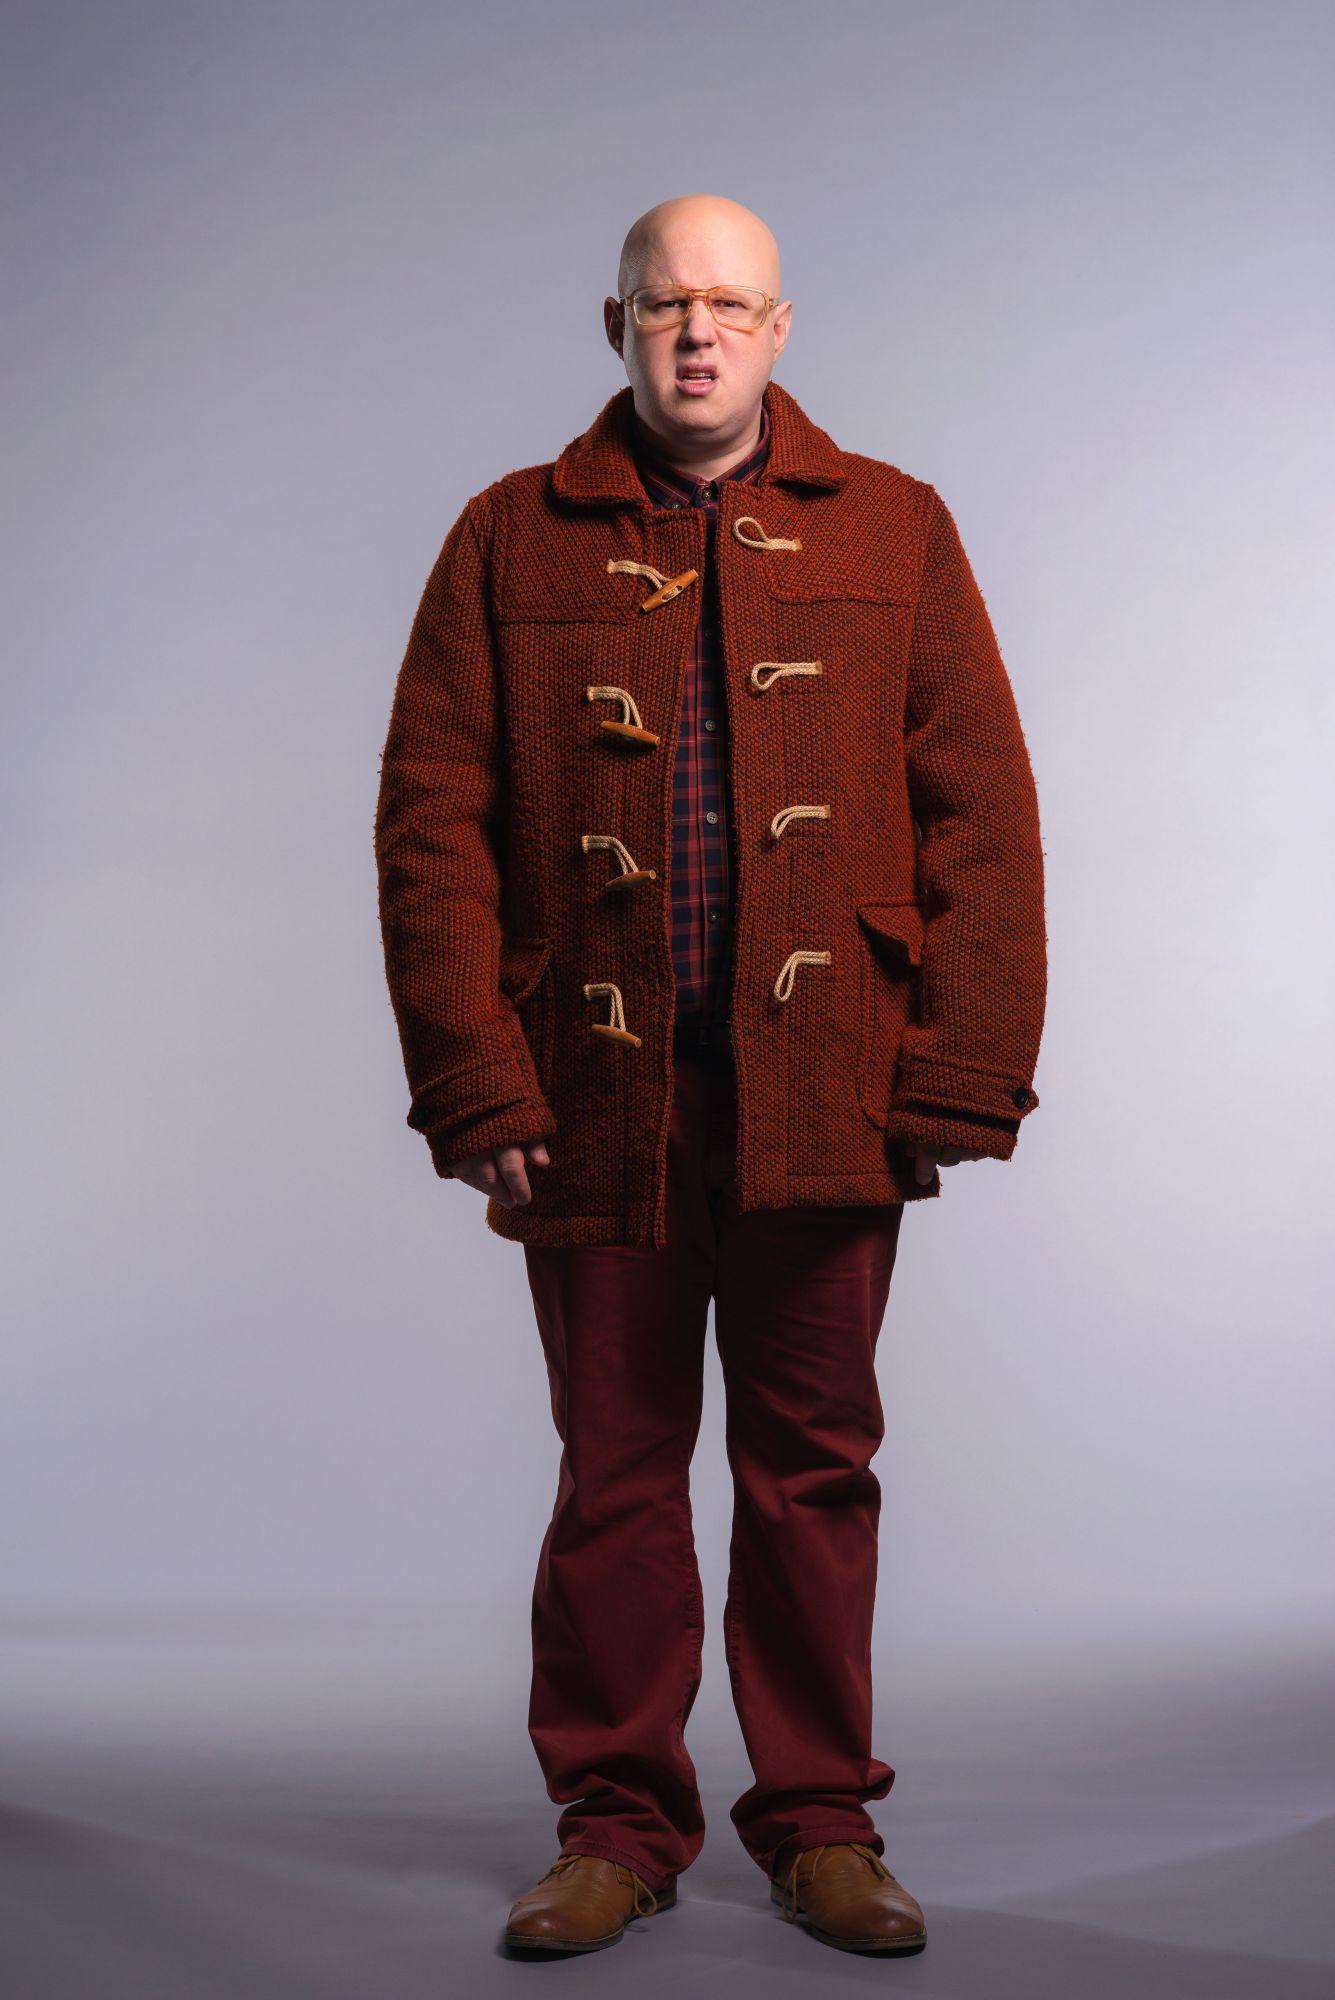 Nardole, as played by Matt Lucas (Credit: BBC/Des Willie)